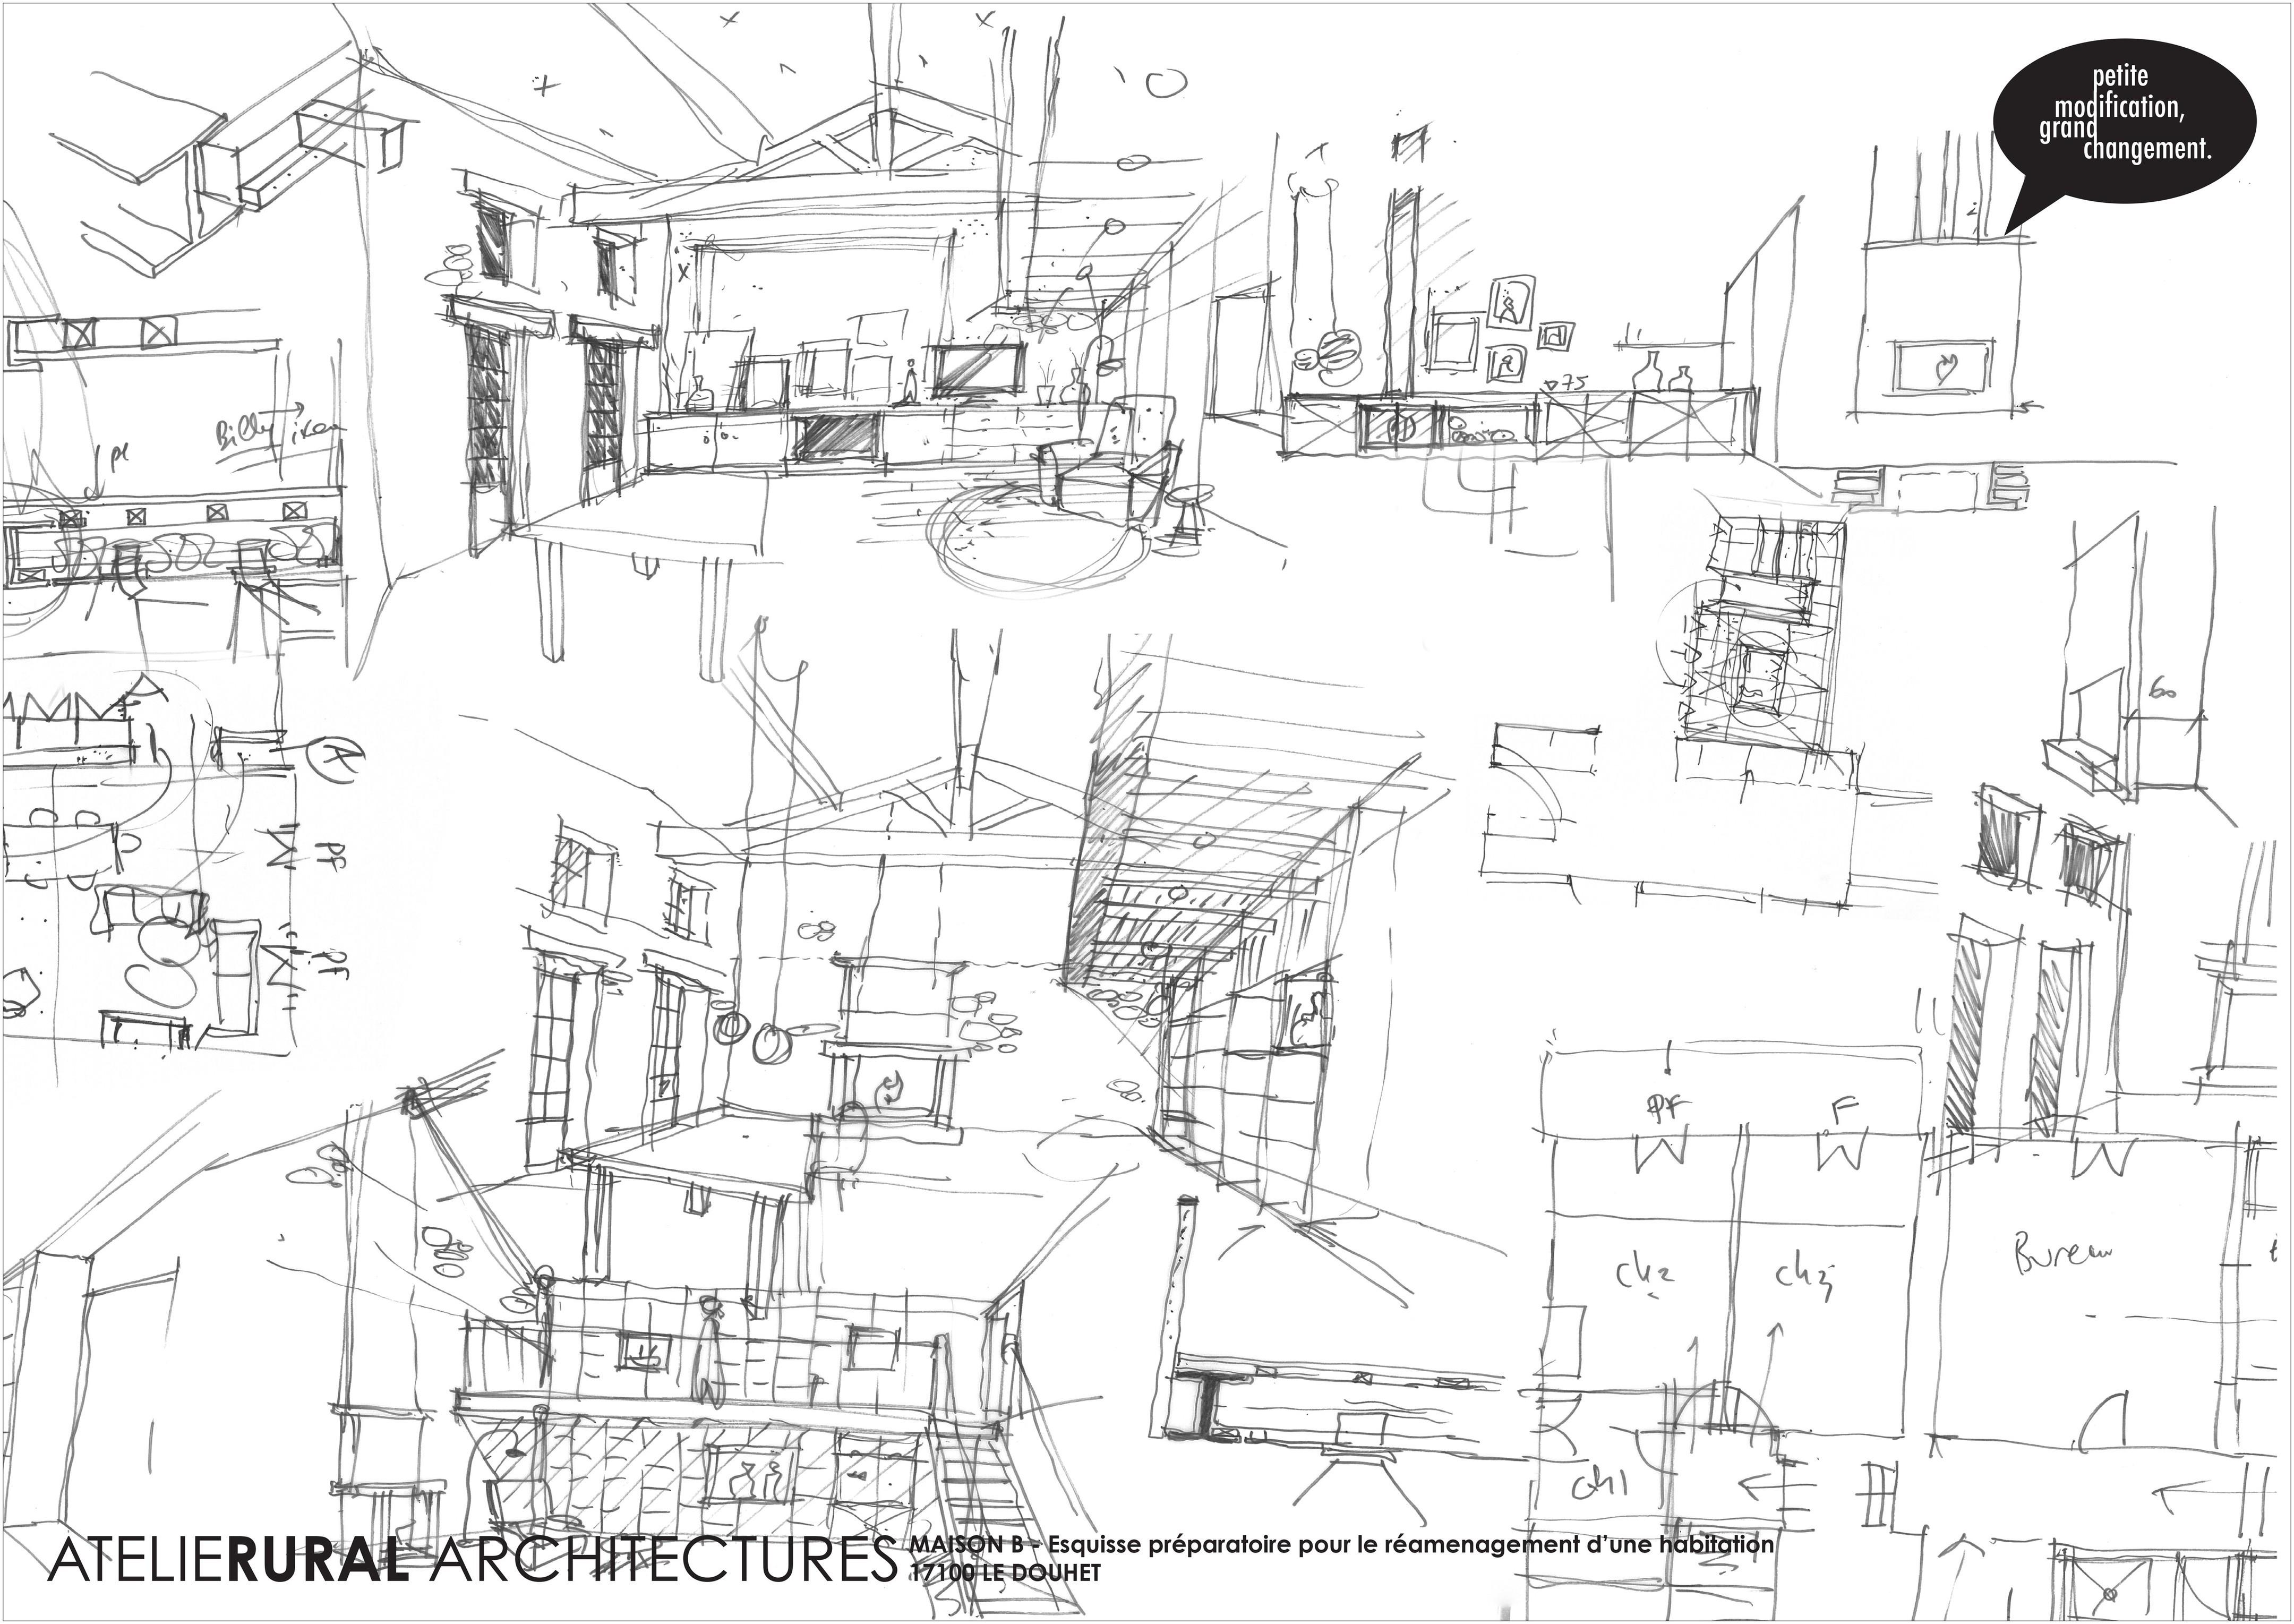 Maison Brisset Atelierural Architectures